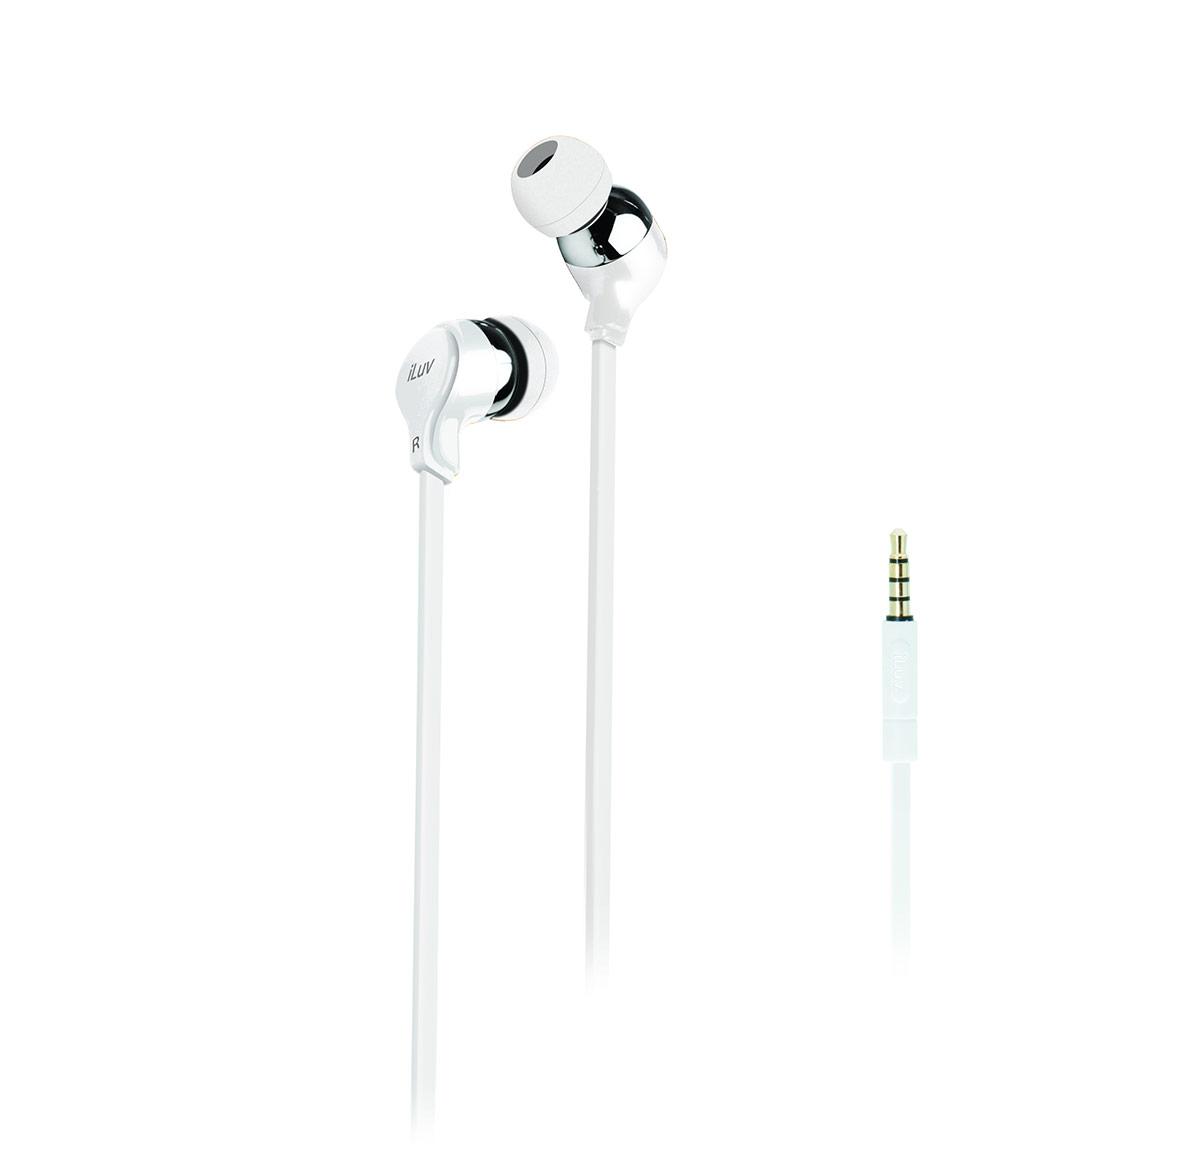 Party On In-Ear Stereo Earphones - White